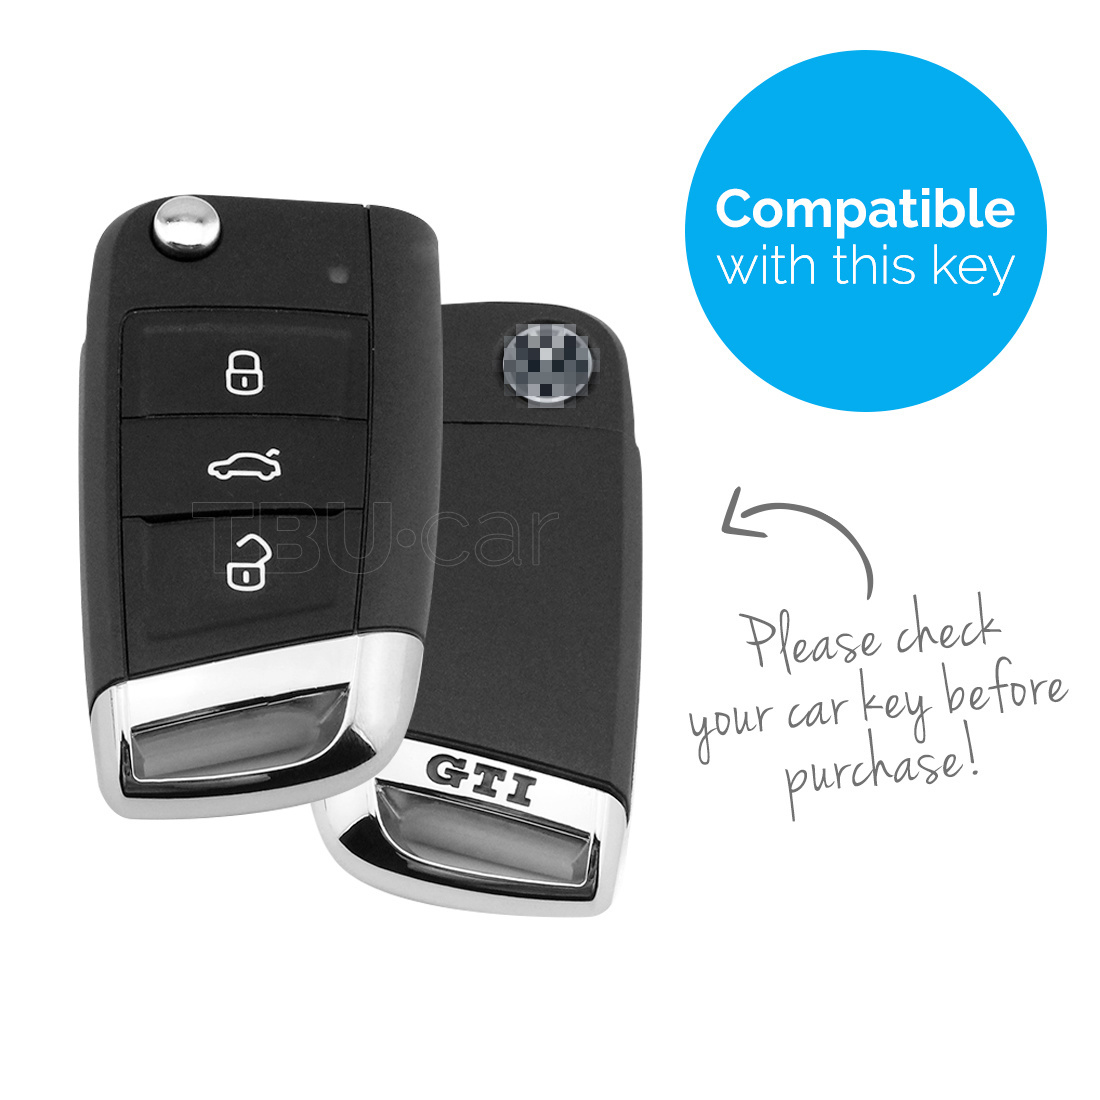 TBU car TBU car Autoschlüssel Hülle kompatibel mit VW GTI / R-Line 3 Tasten - Schutzhülle aus Silikon - Auto Schlüsselhülle Cover in Rosa